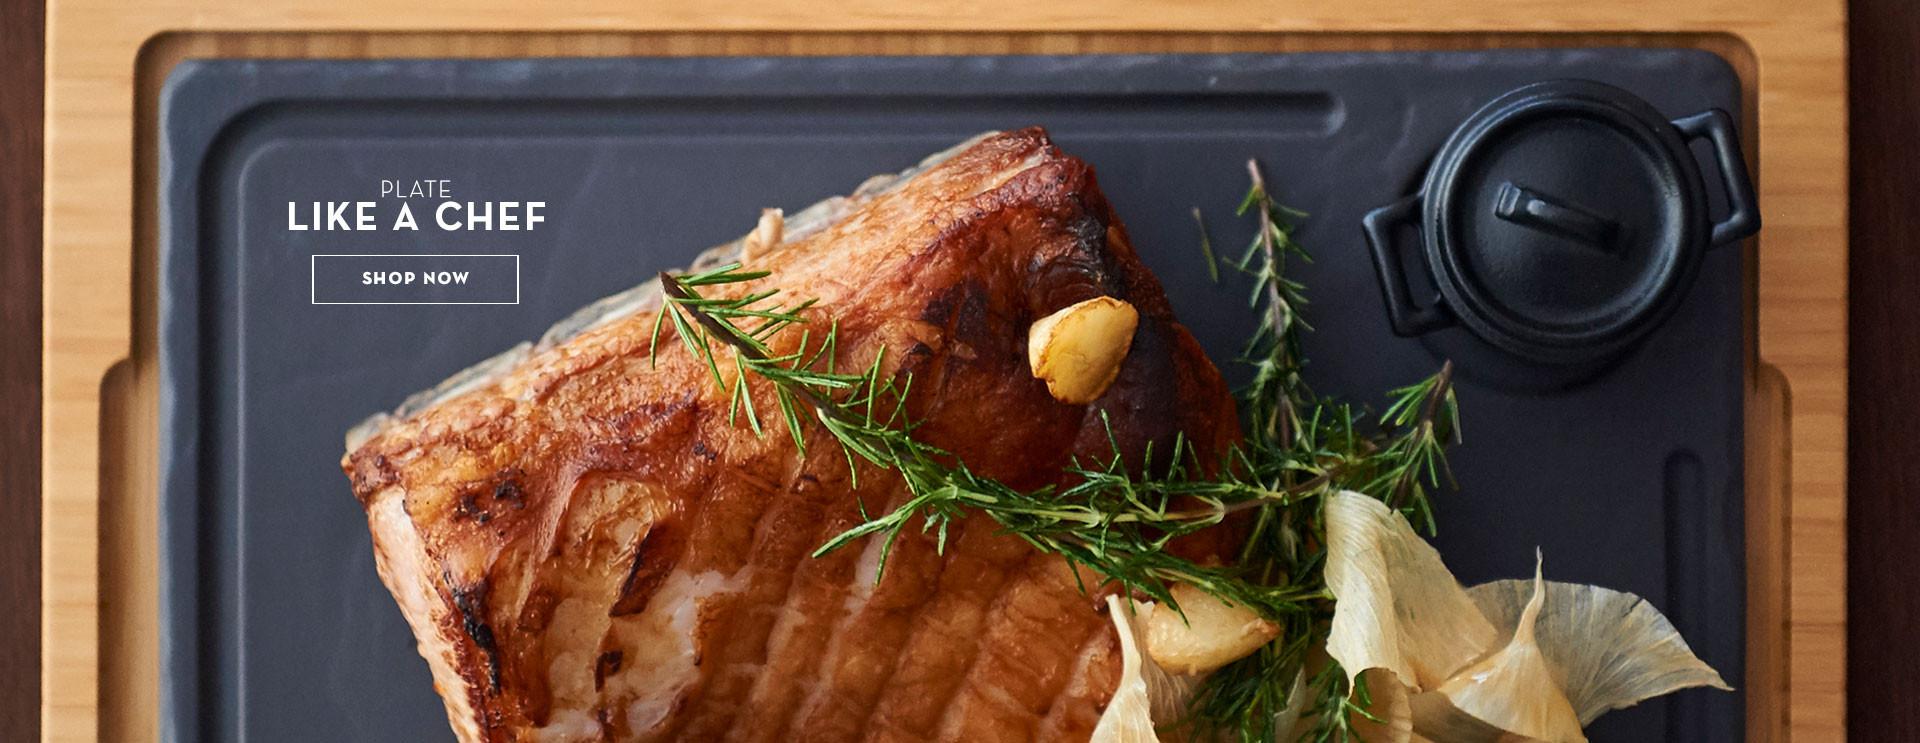 basalt steak plate